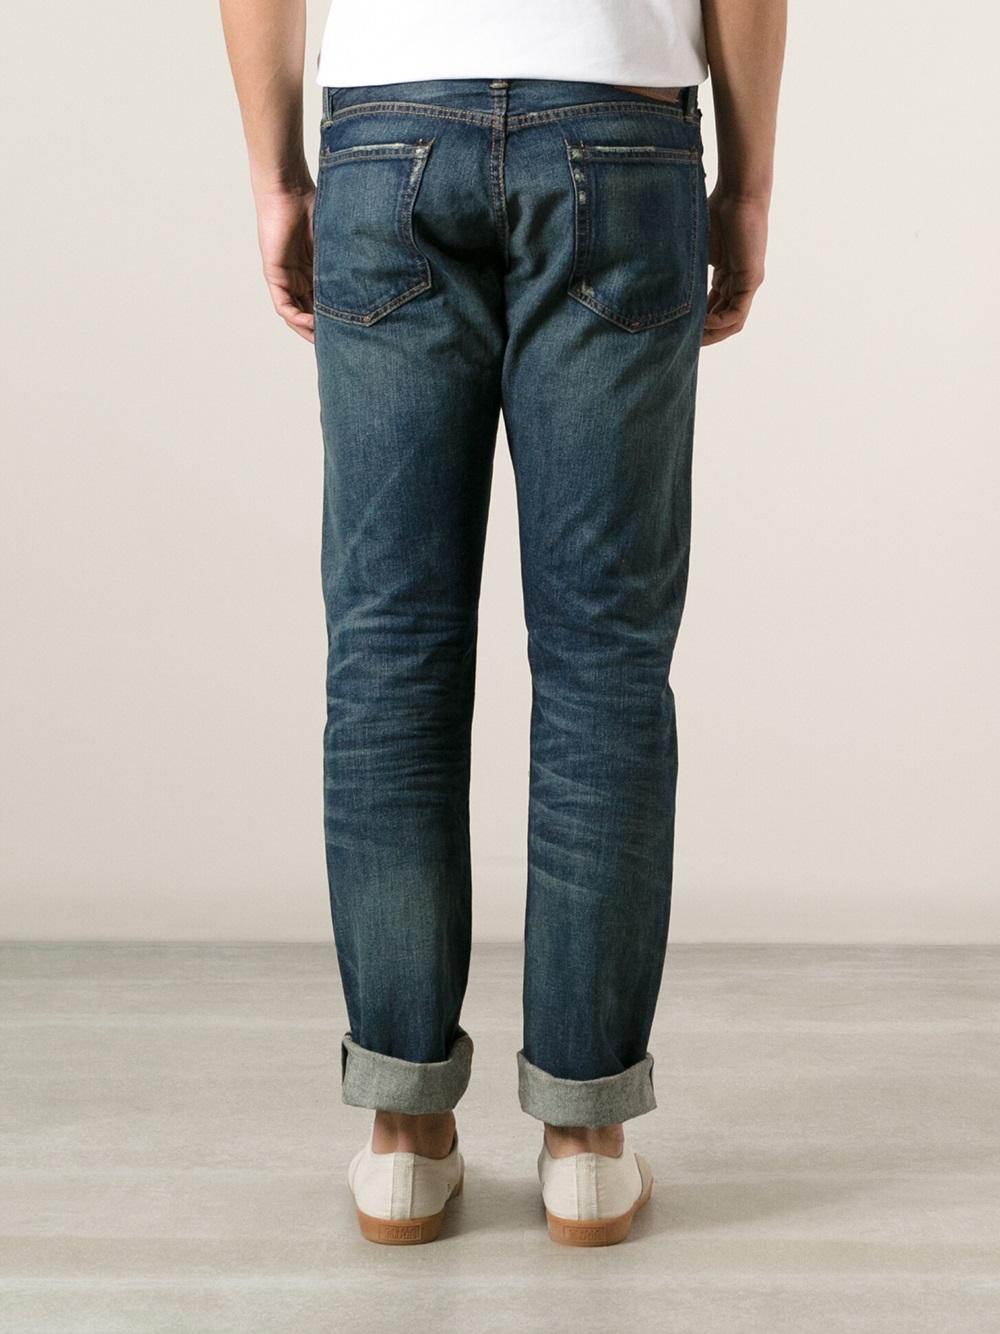 marein polo ralph lauren varick jeans. Black Bedroom Furniture Sets. Home Design Ideas